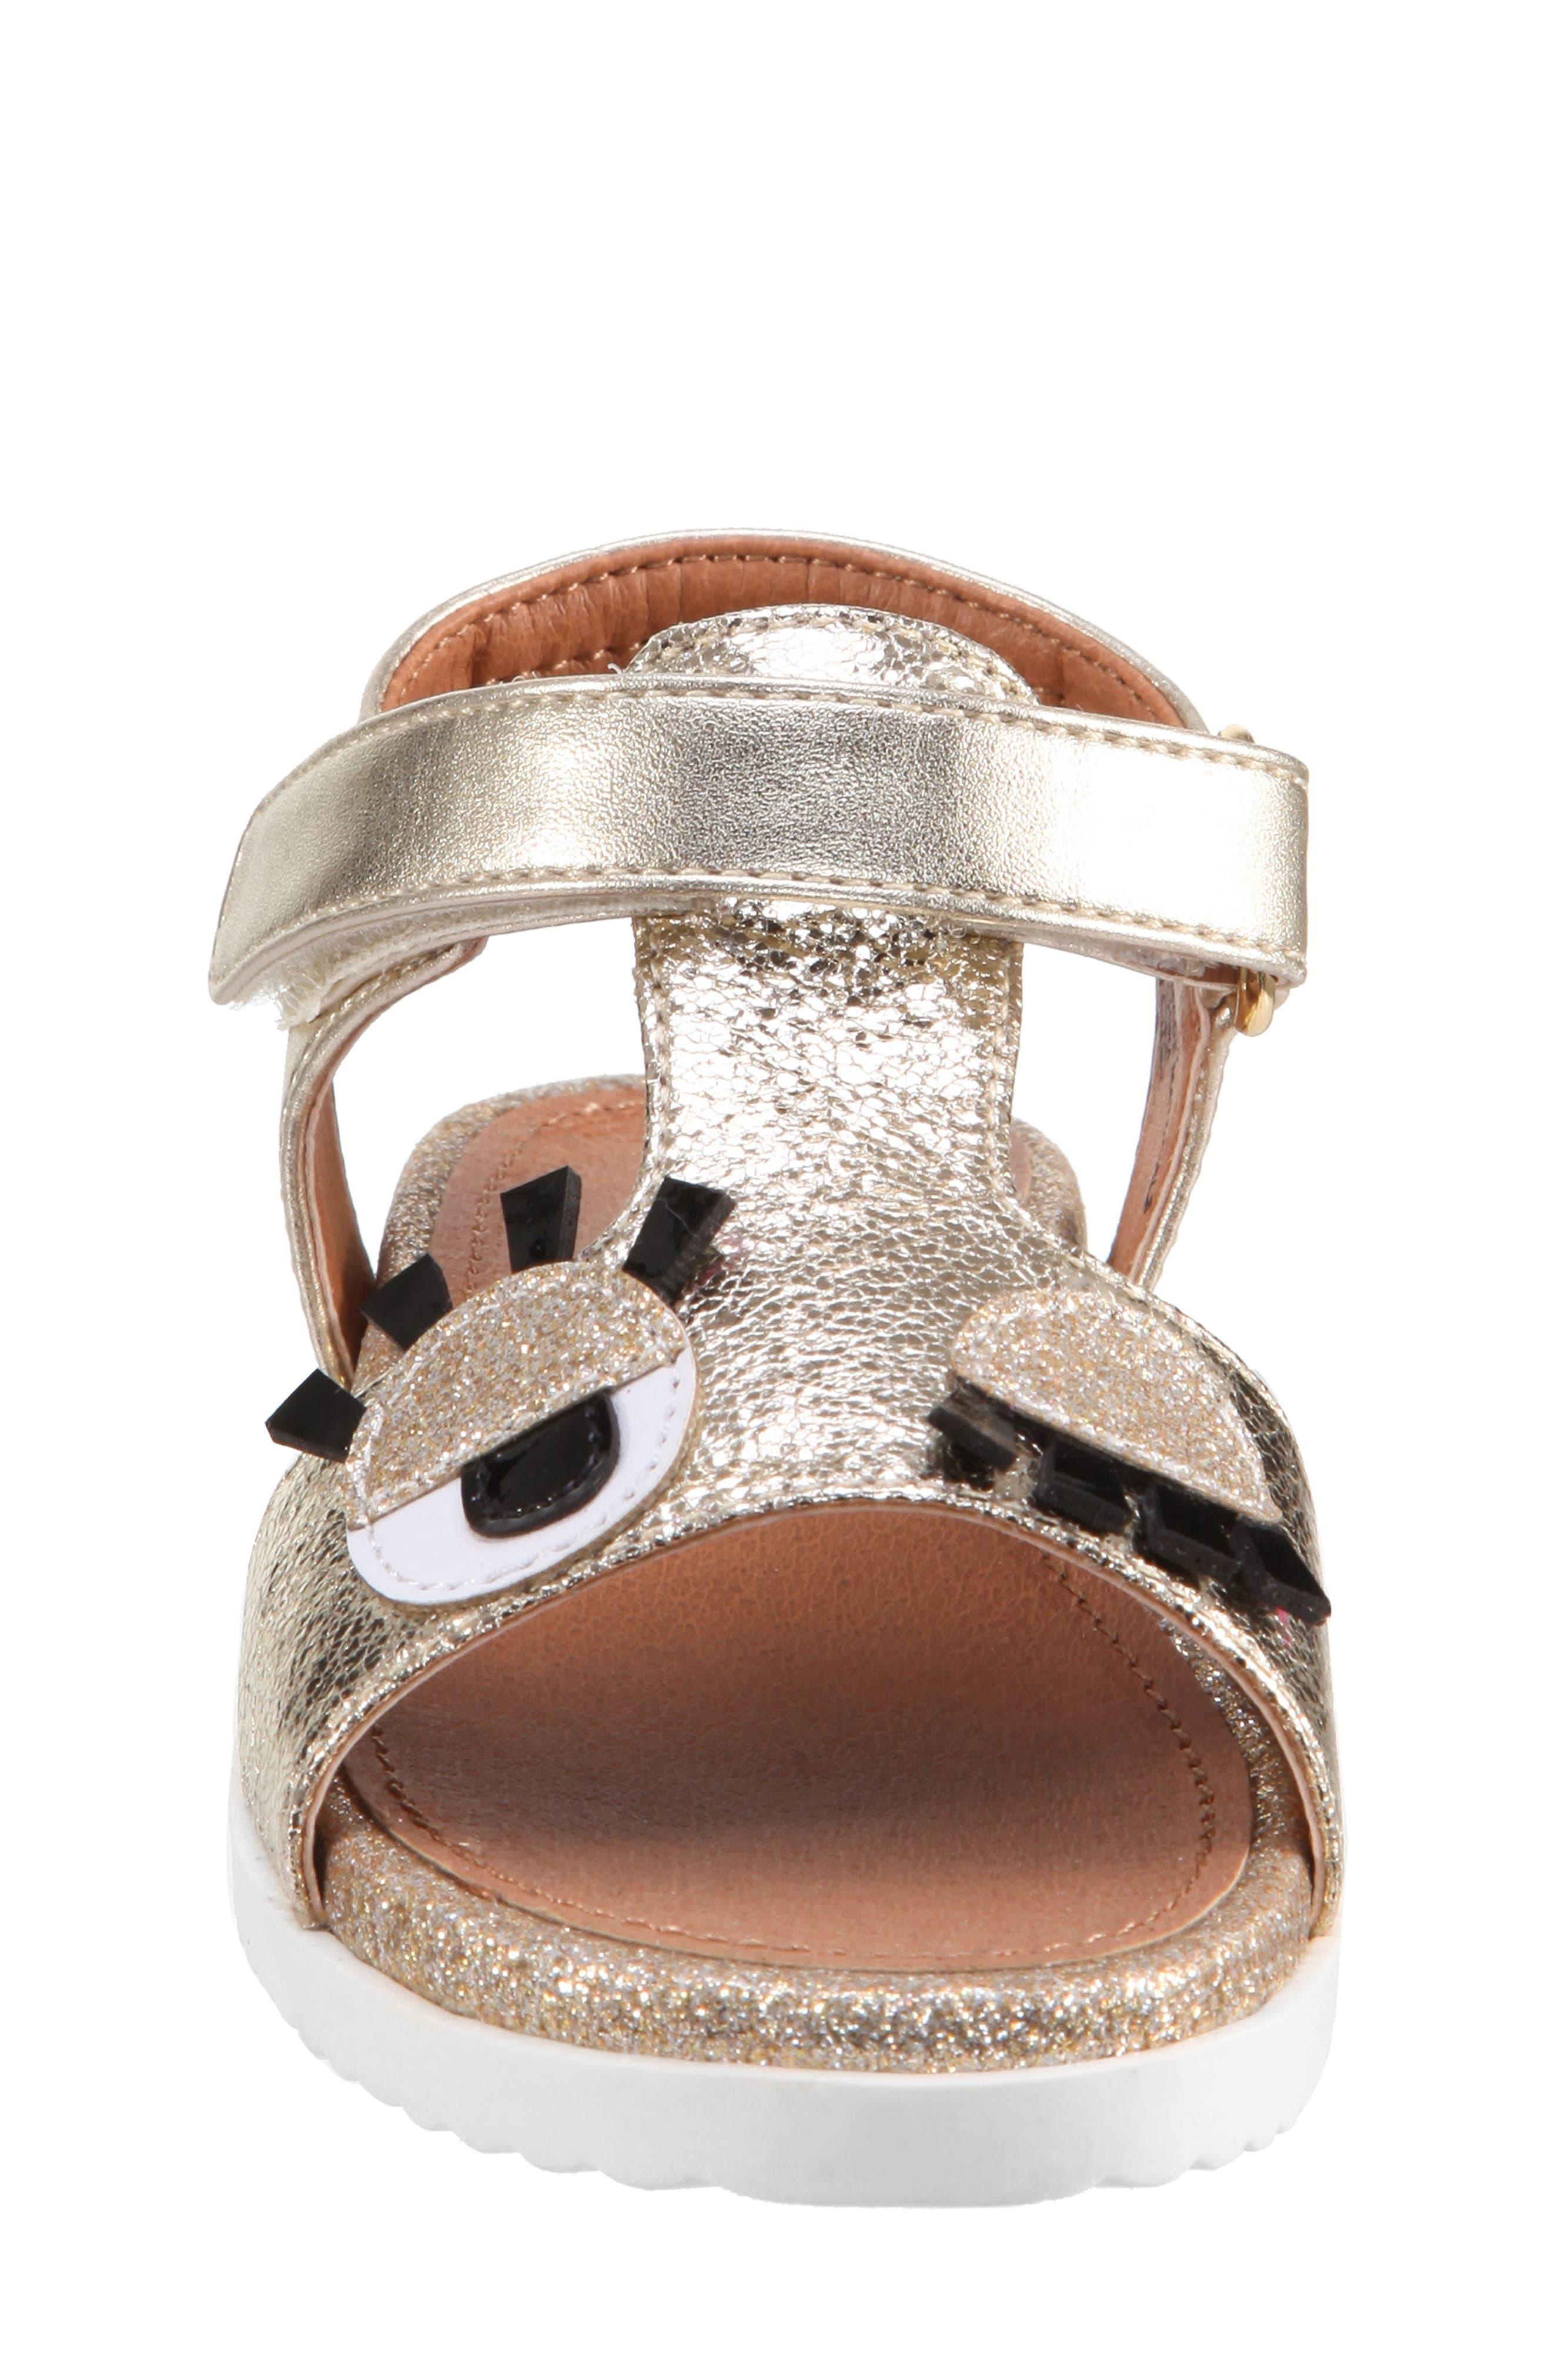 Luciella Wink Sandal,                             Alternate thumbnail 3, color,                             Platino Metallic Crackle